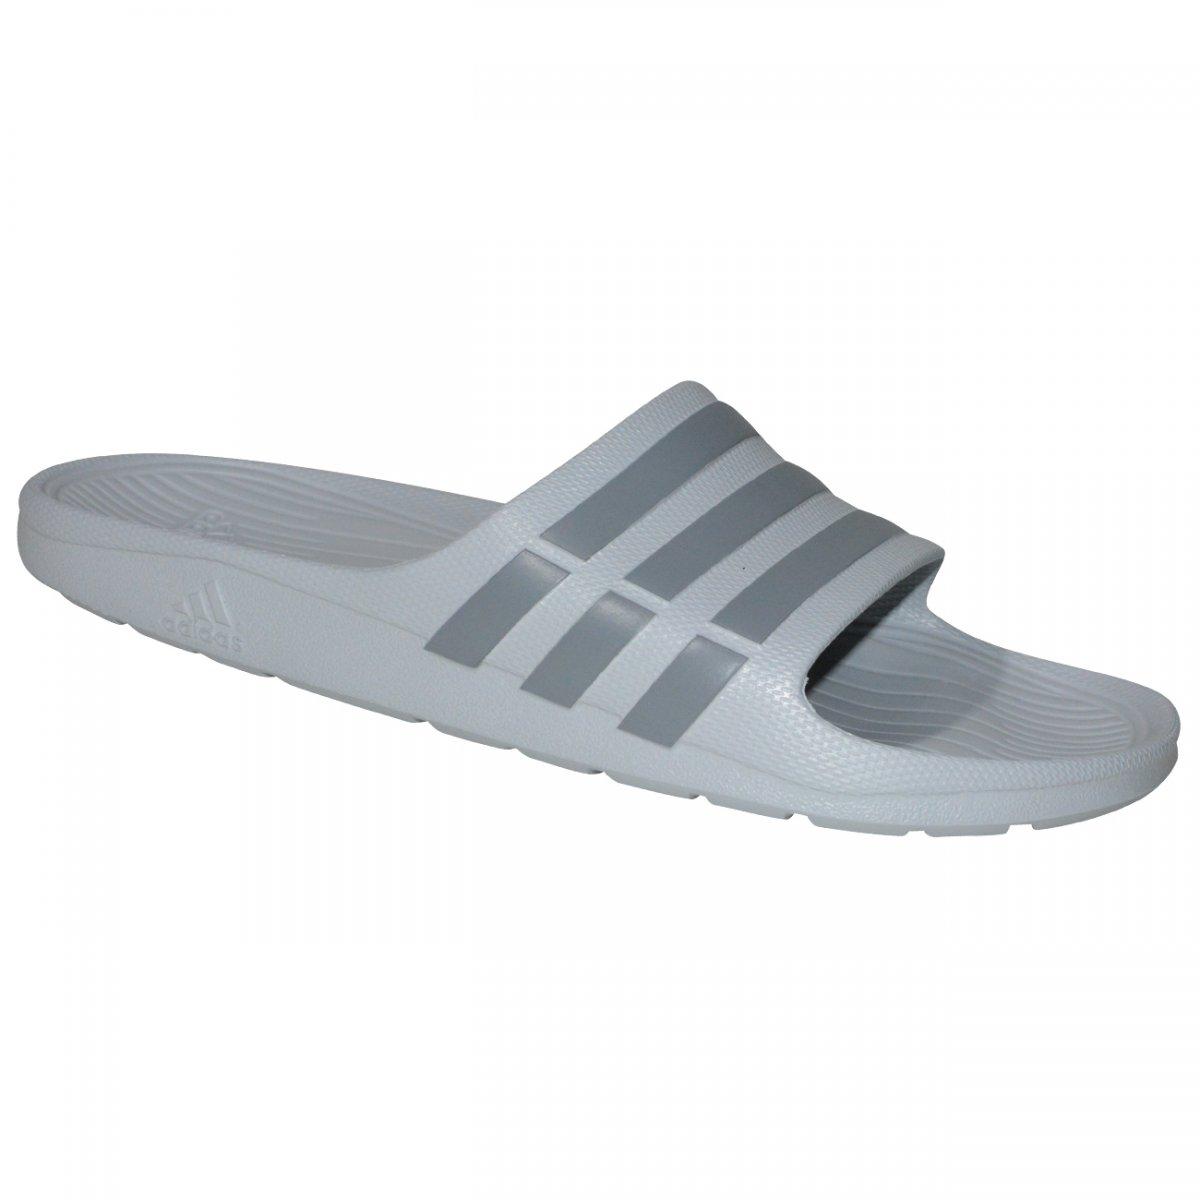 9139425494 Chinelo Adidas Duramo Slide B44298 - Cinza chumbo - Chuteira Nike ...